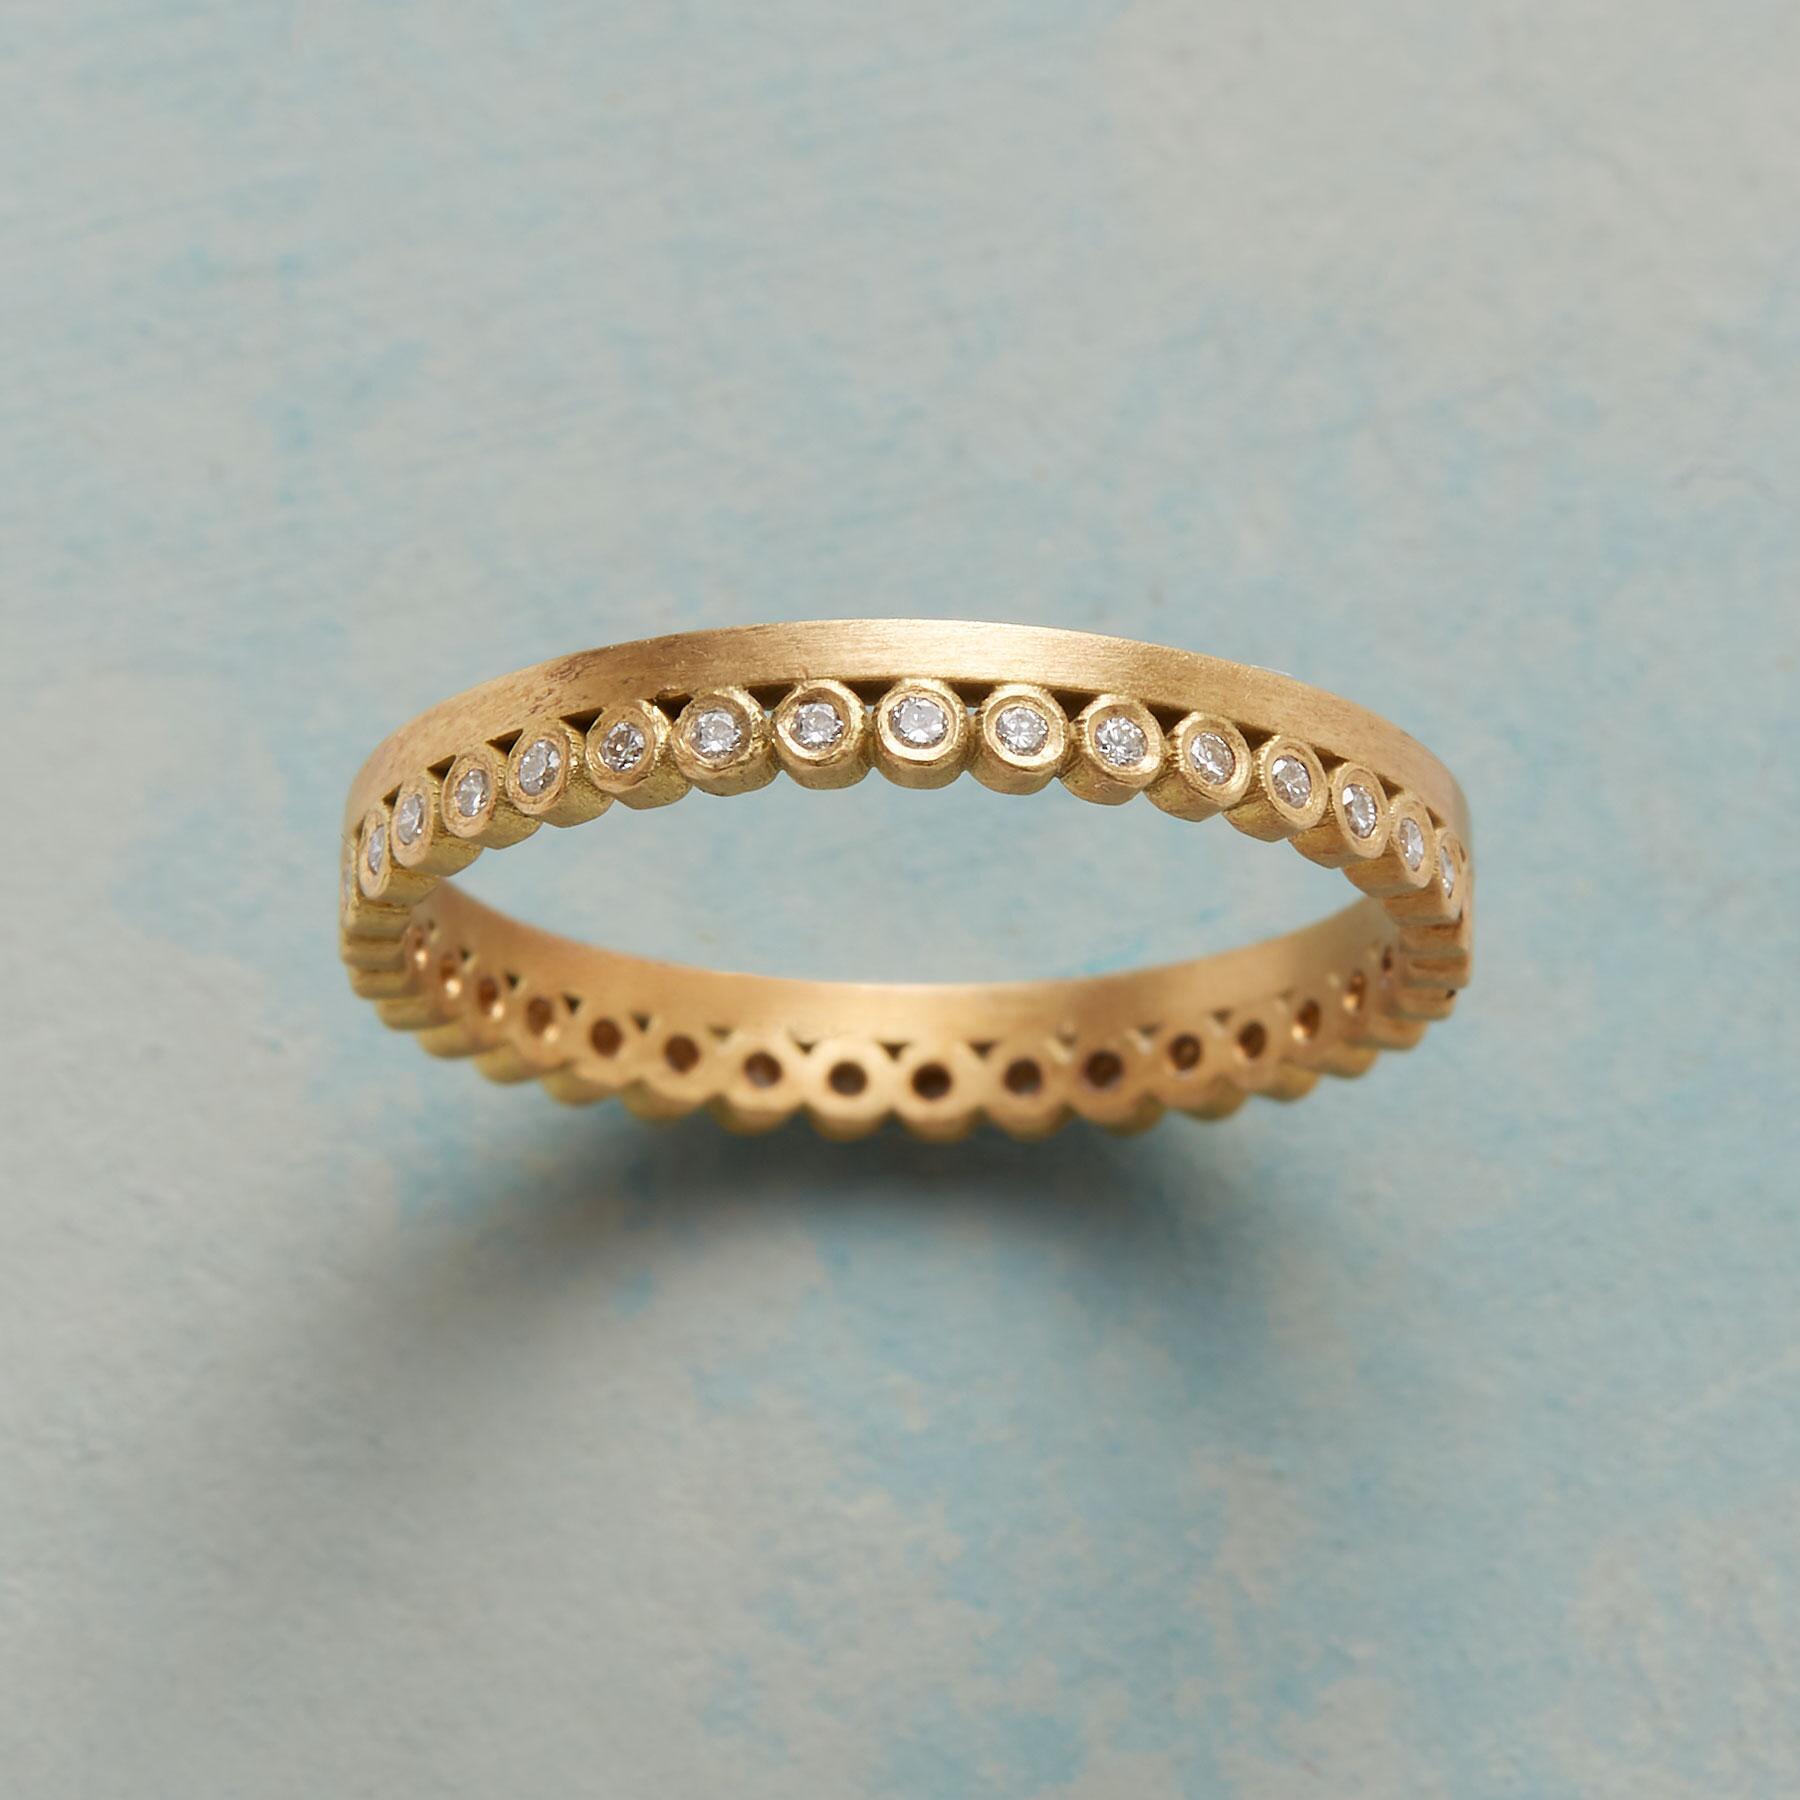 UNDER THE RADAR DIAMOND RING: View 1